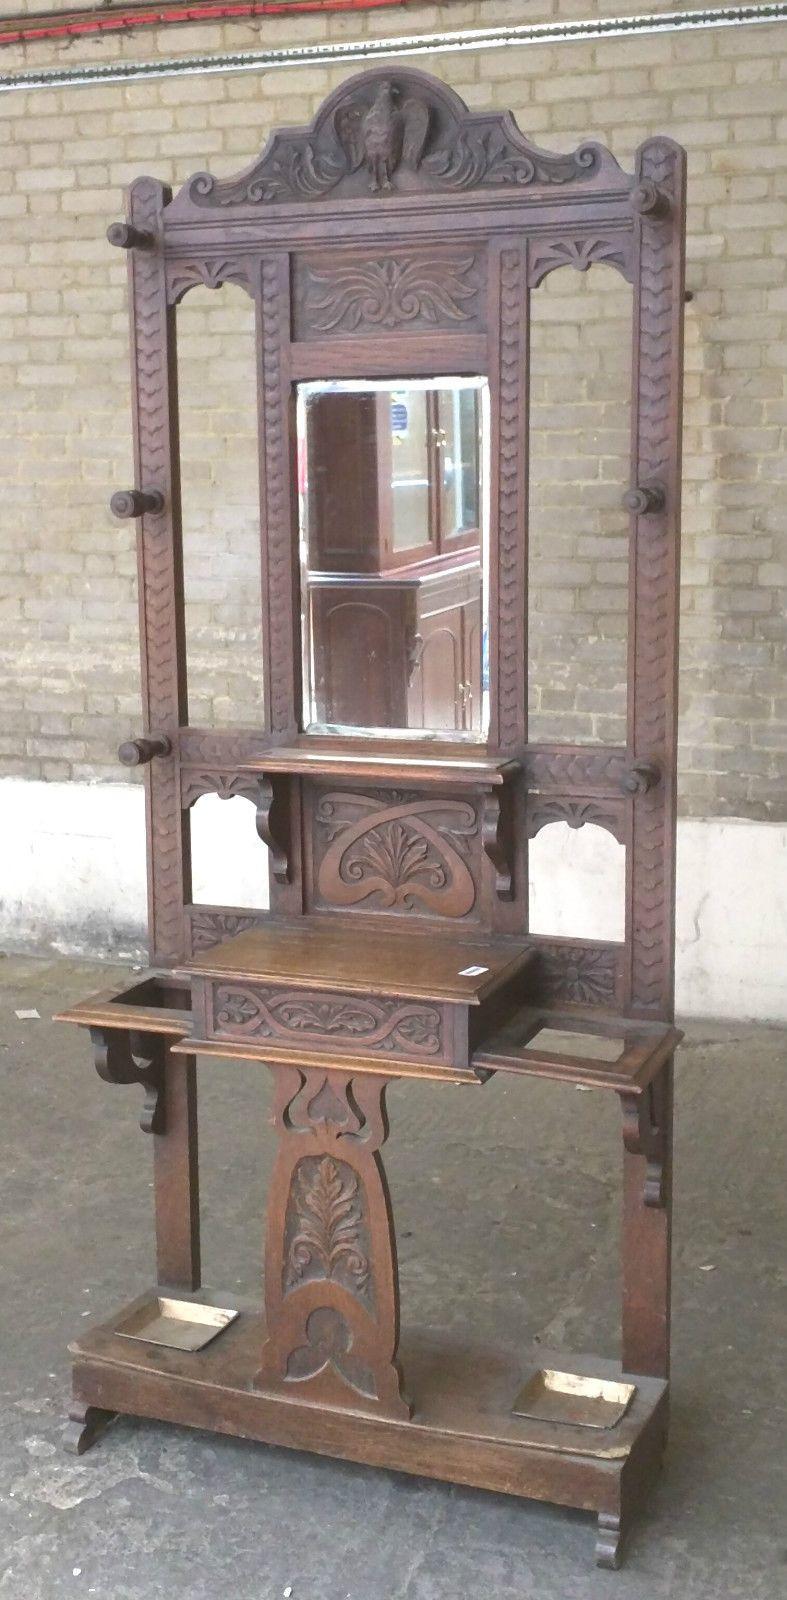 Antique Vintage Unbranded Ornate Wooden Coat Umbrella Stand With Mirror C76 Ebay Umbrella Stand Victorian Furniture Antiques